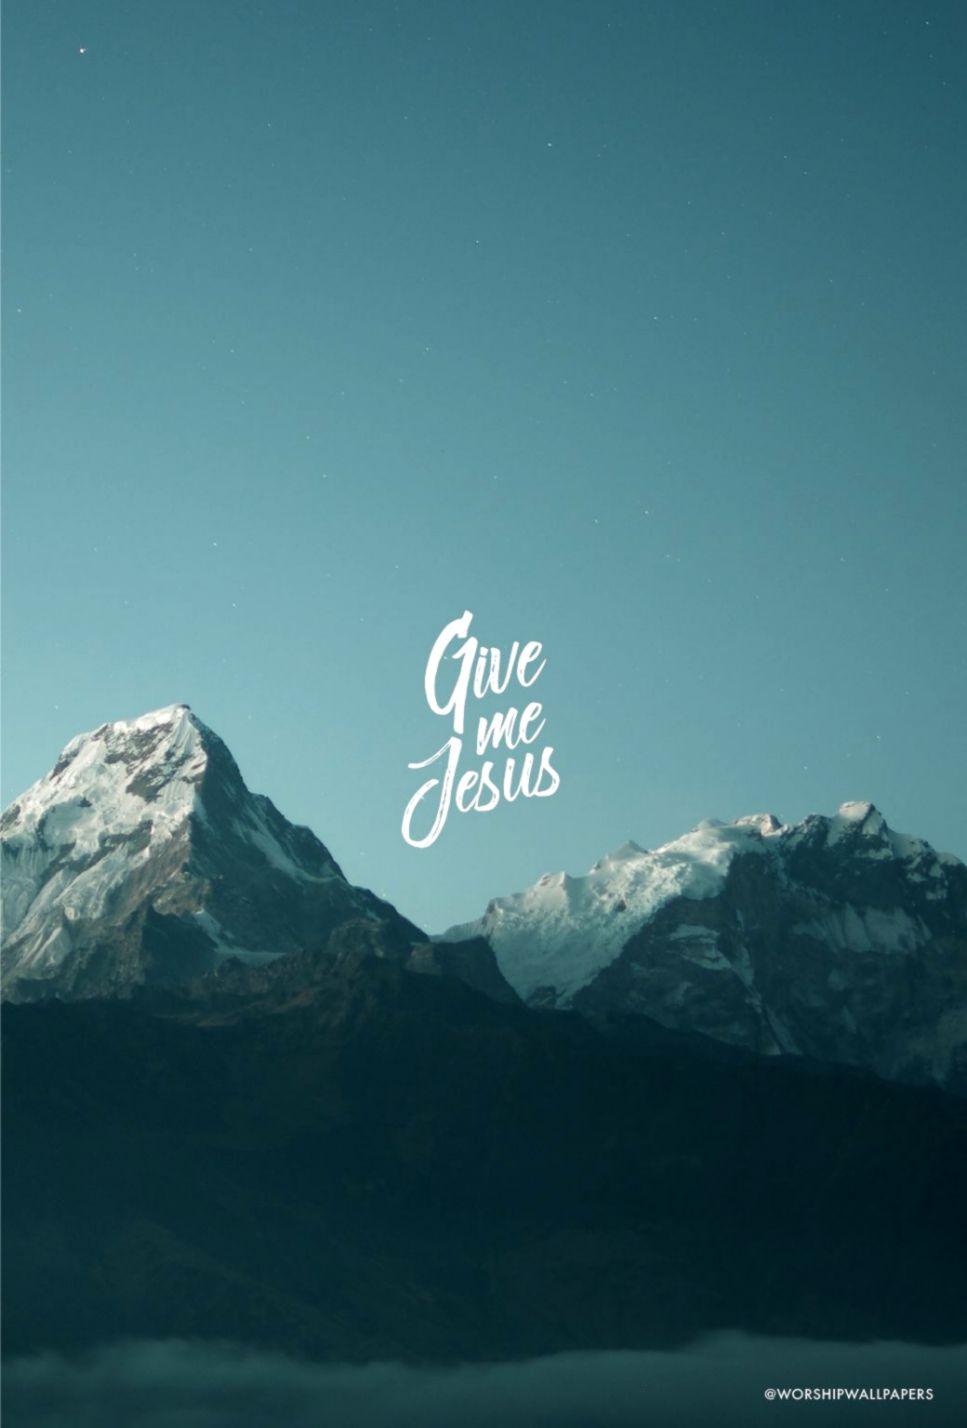 Worship songs as wallpapers Inspiration My jesus Worship